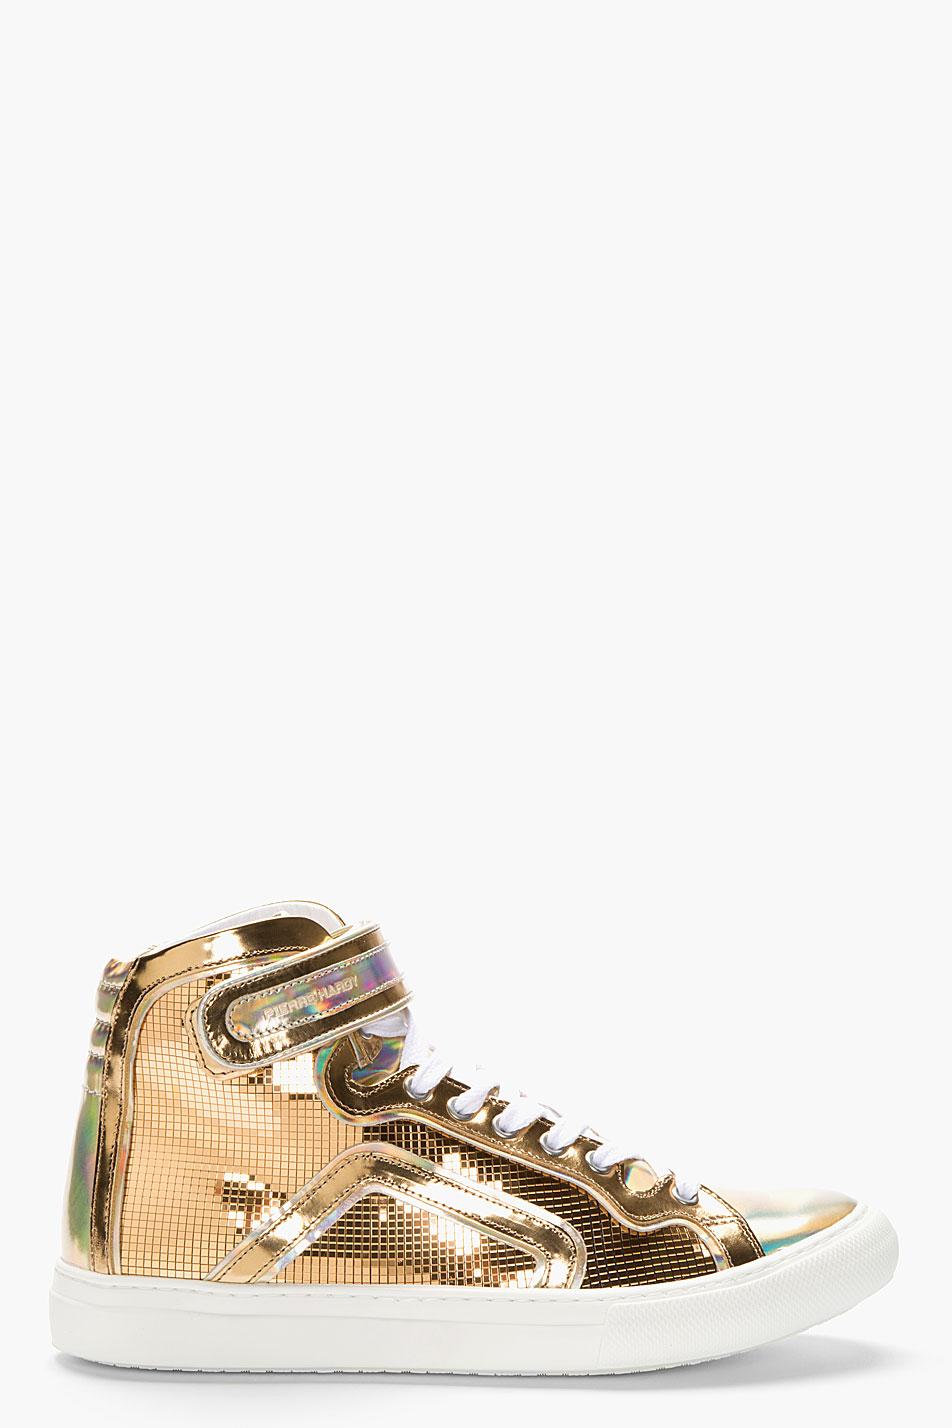 Pierre Hardy Mens Shoes Sale